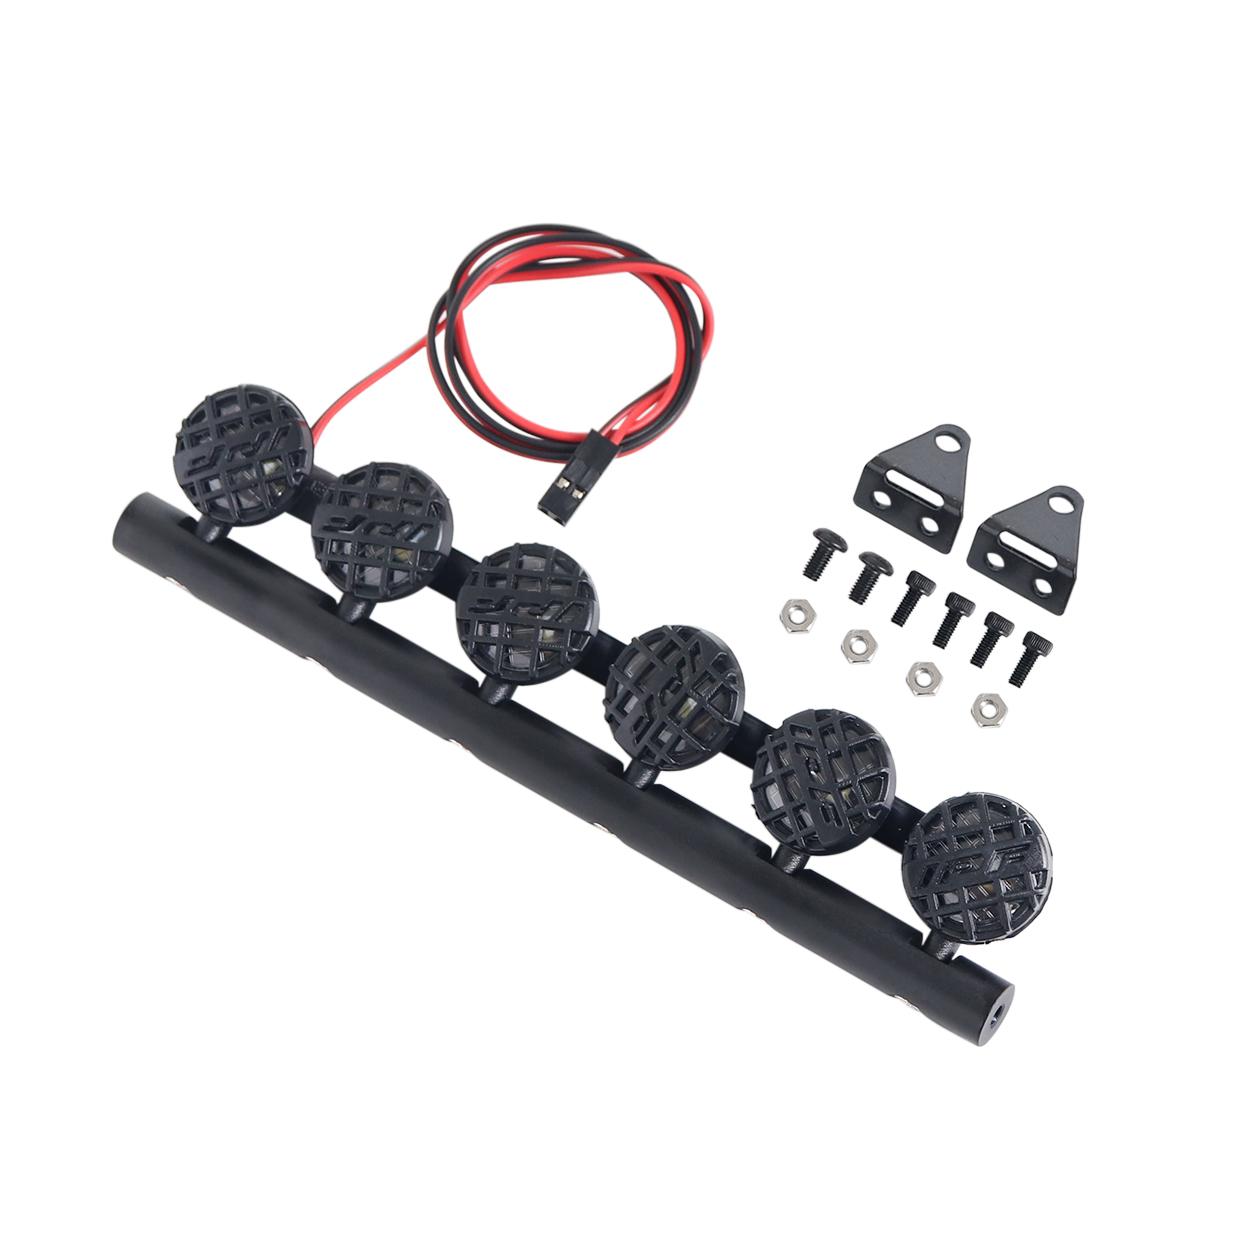 Spotlight LED Car Roof Lights Bar for 1/10 TRAXXAS TRX4 SCX10 90046 90047 D90 D110 RC Crawler Car Upgrade Parts 6 lights